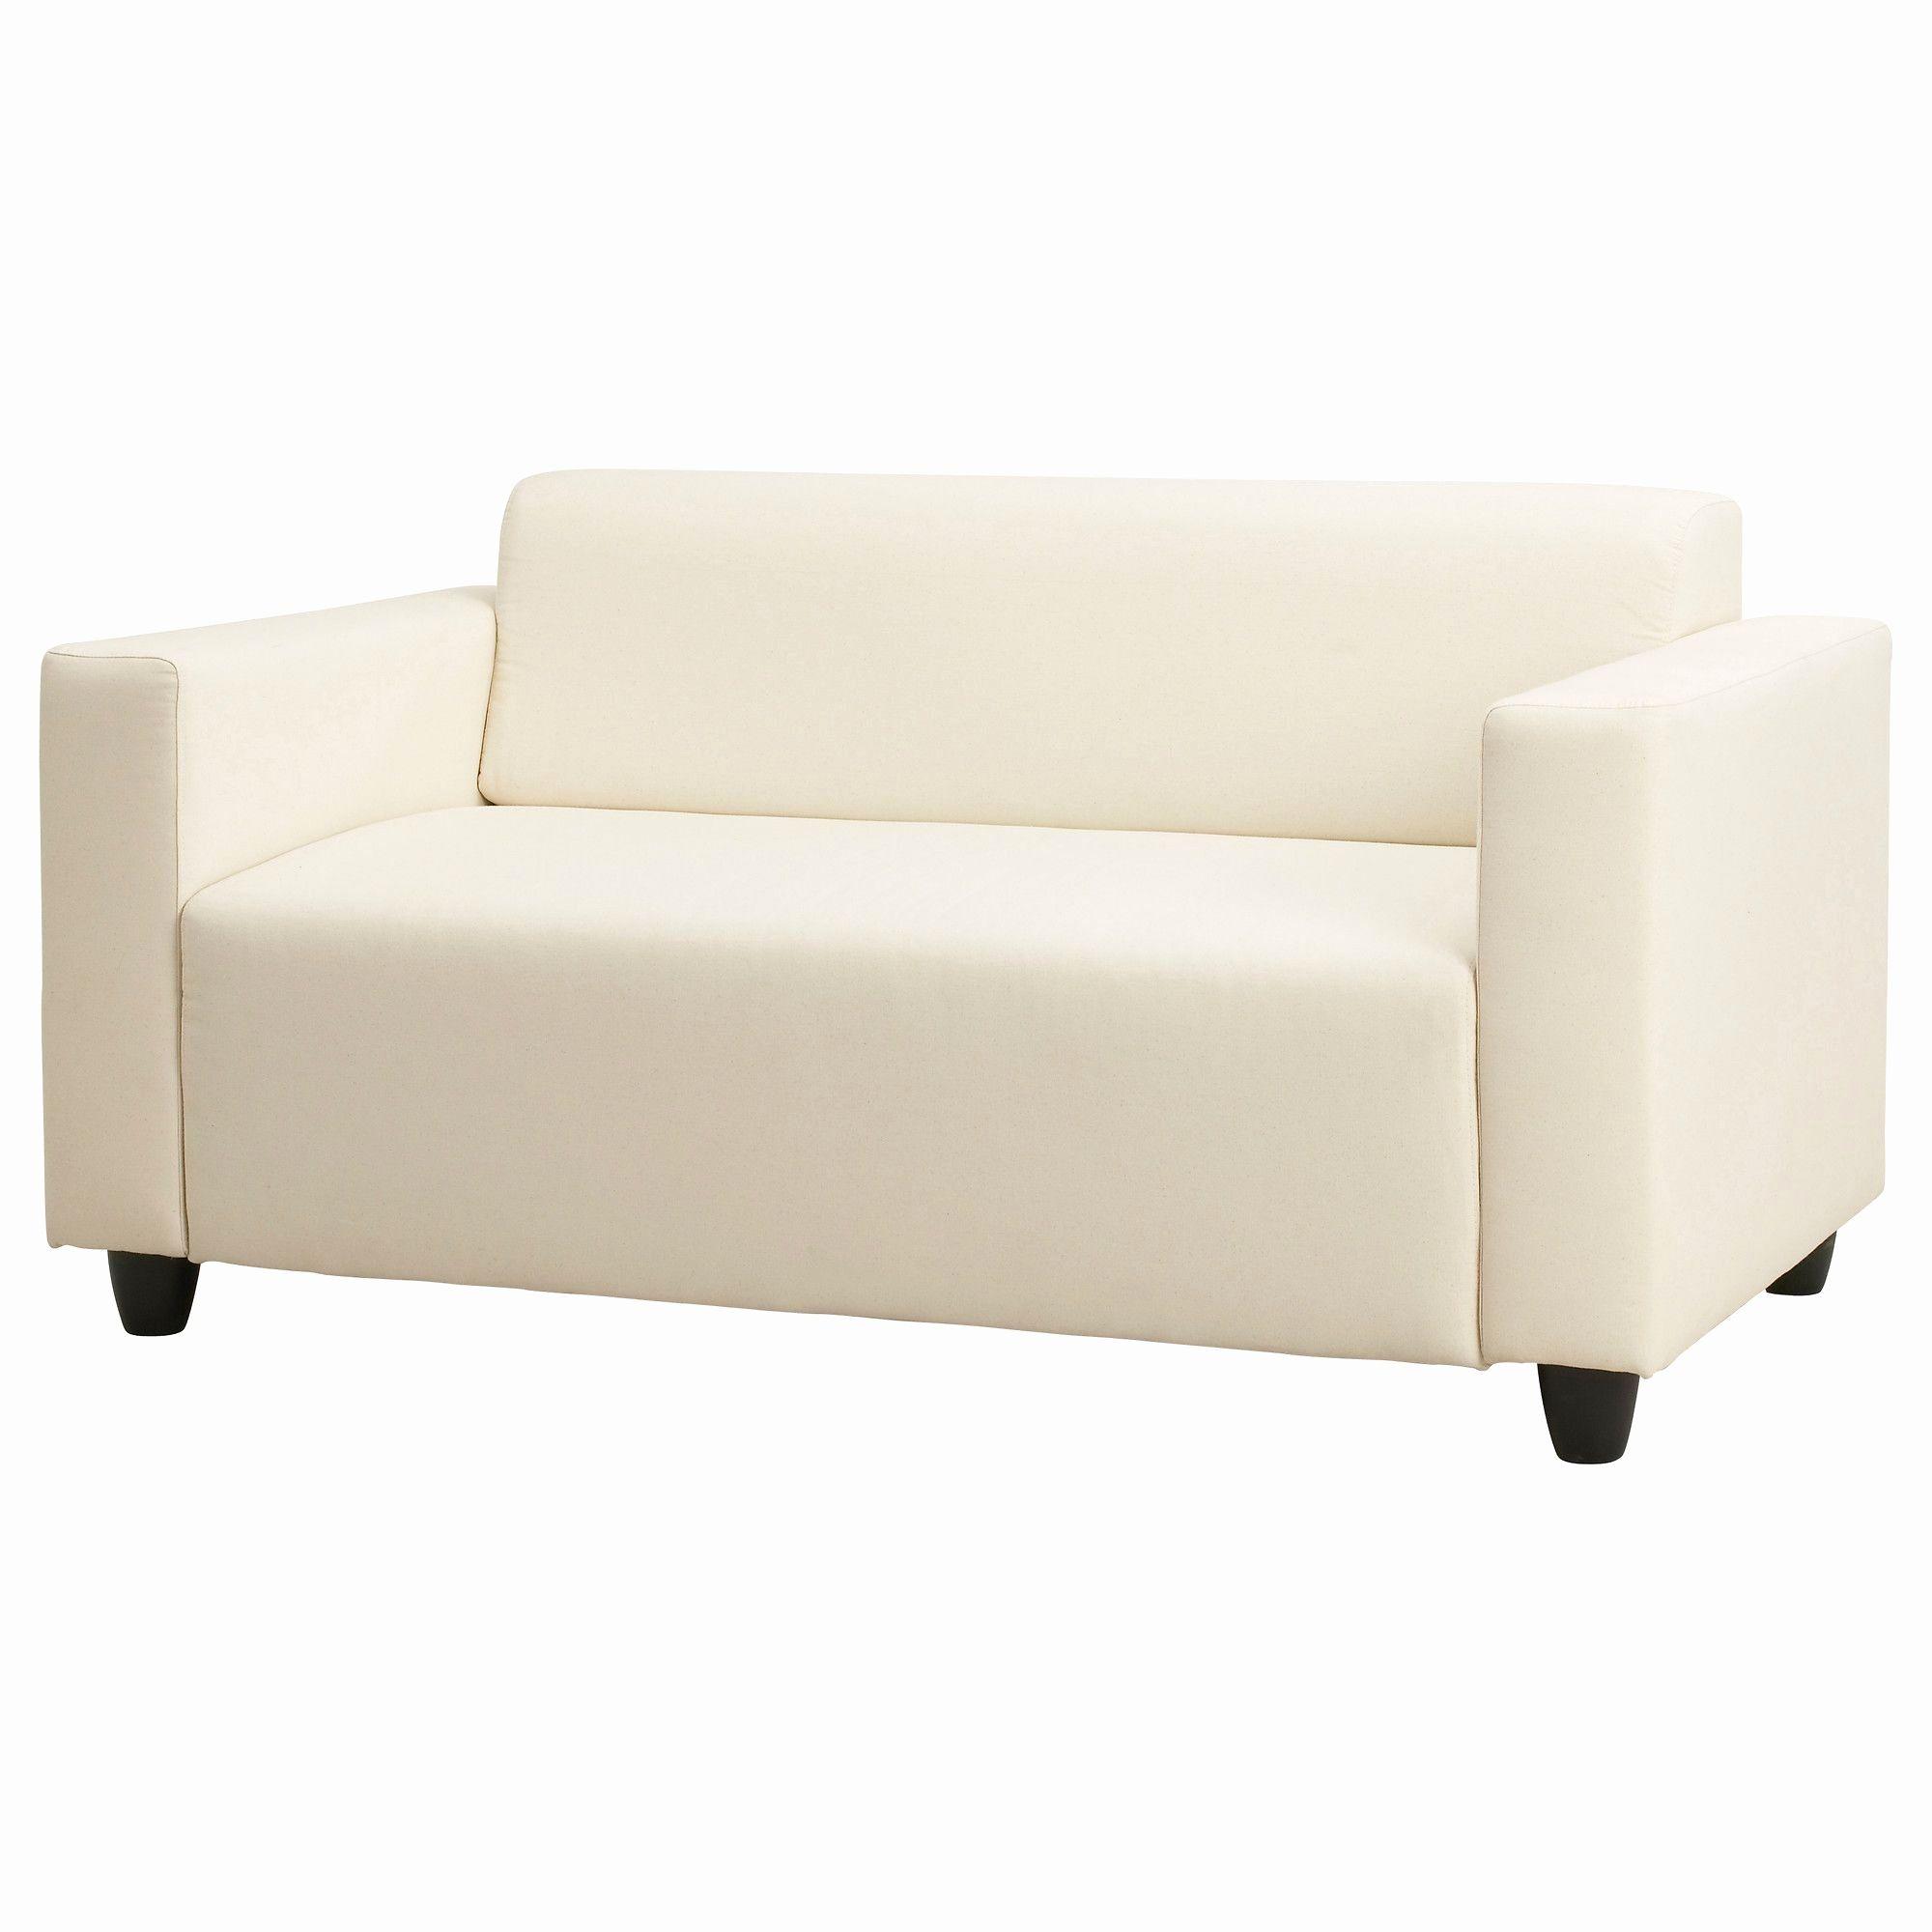 Sofa Hellgrau Frisch Otto Wohnzimmer Sofa Eindeutig Big Sofa Grau Big Sofa Otto Couch Sammlung Ikea Sofa Sofa Ikea Loveseat